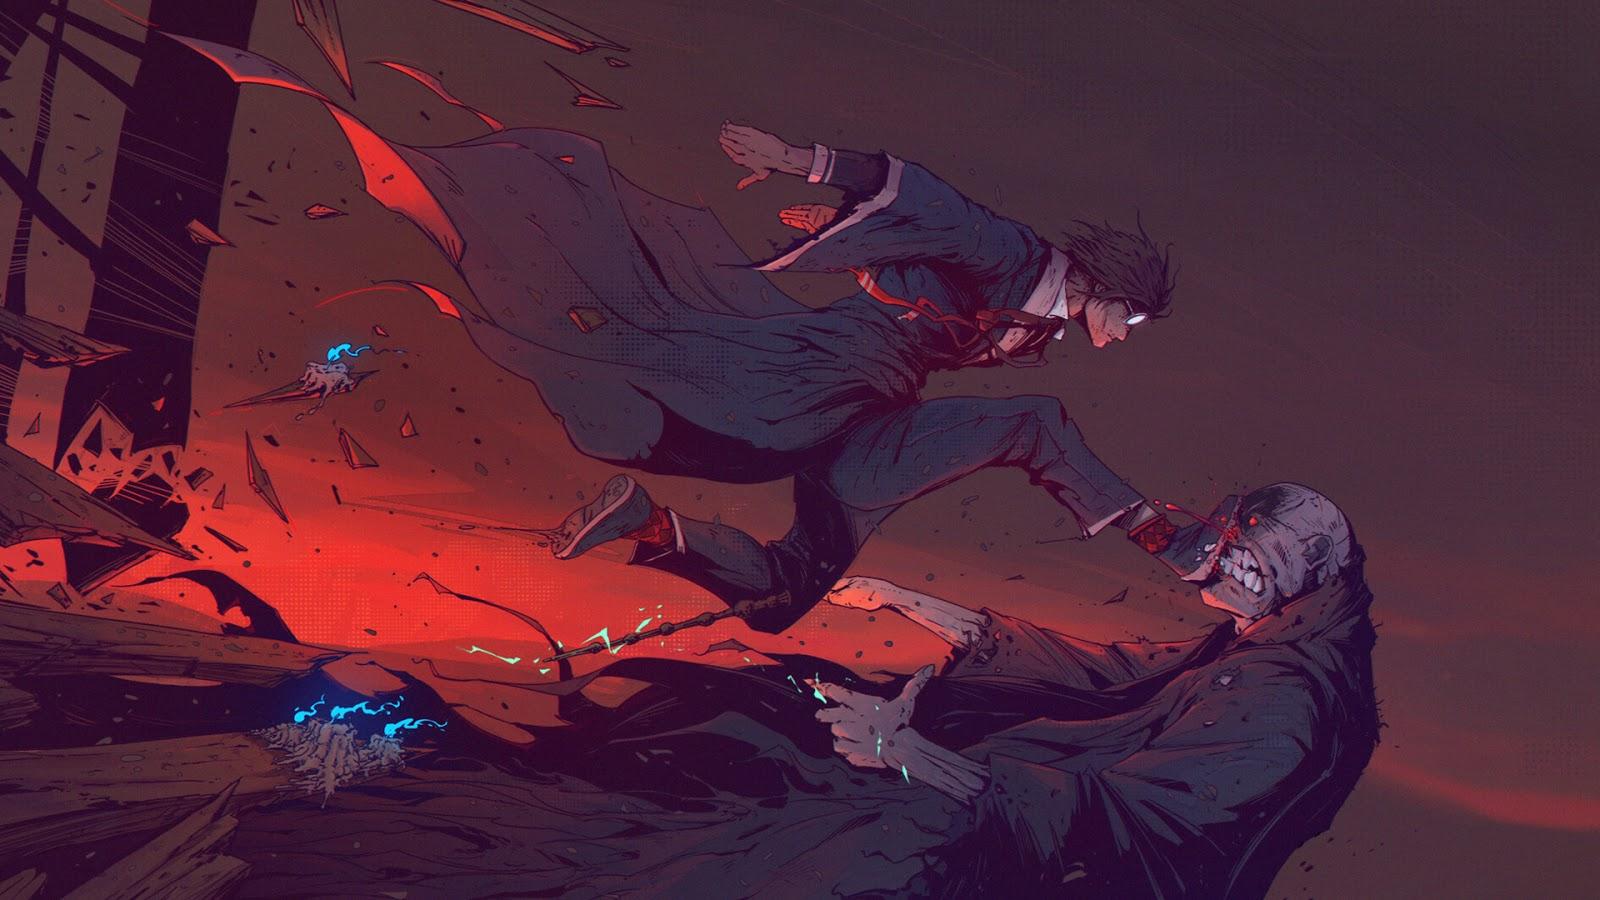 Harry Potter vs. Voldemort anime style wallpaper 1080p